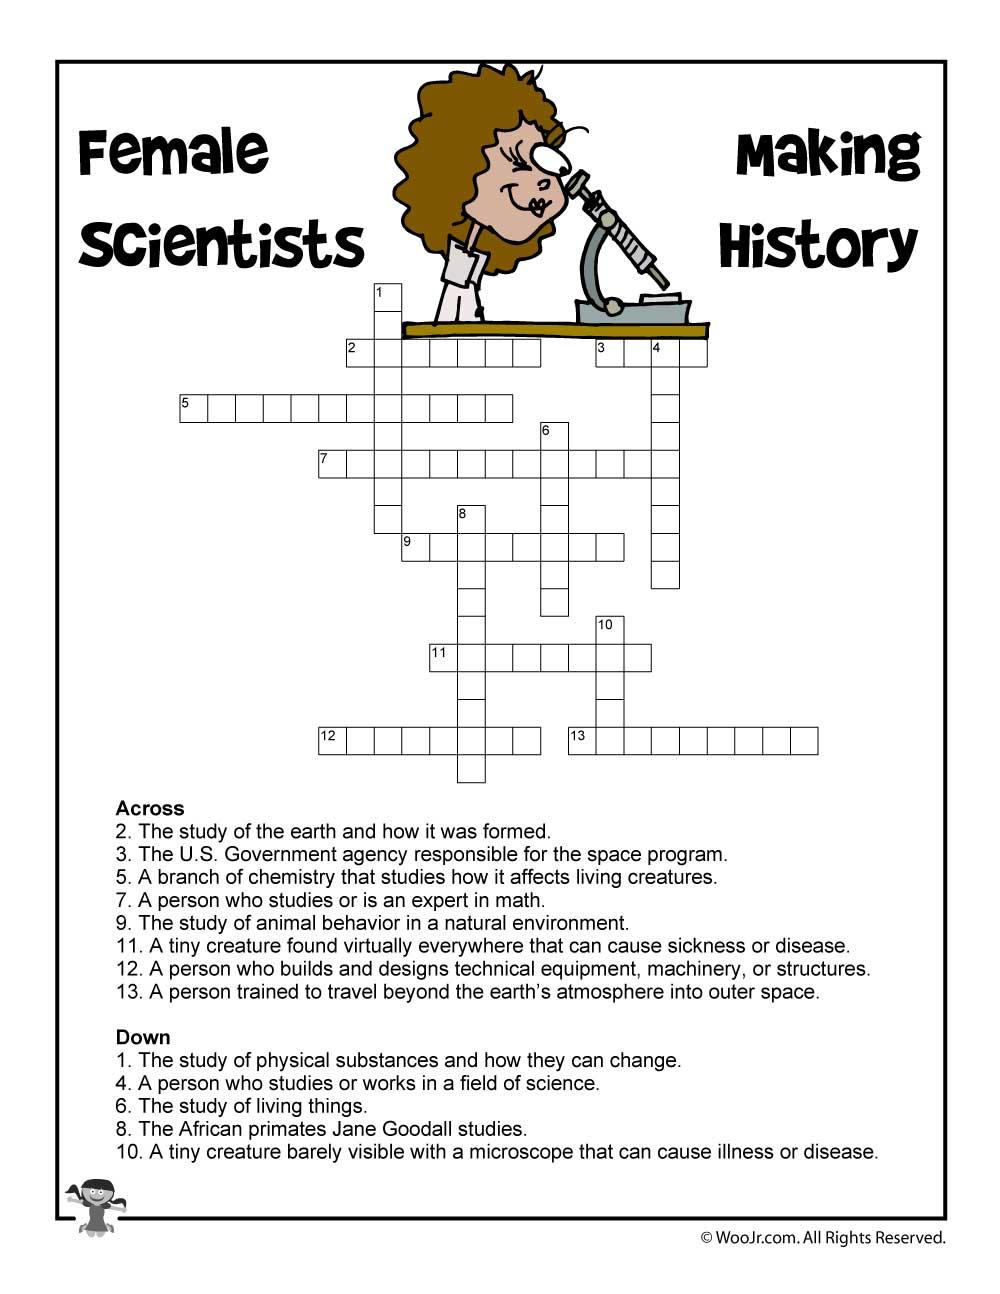 Female Scientists Crossword Puzzle | Woo! Jr. Kids Activities - Printable Crossword Puzzles Science